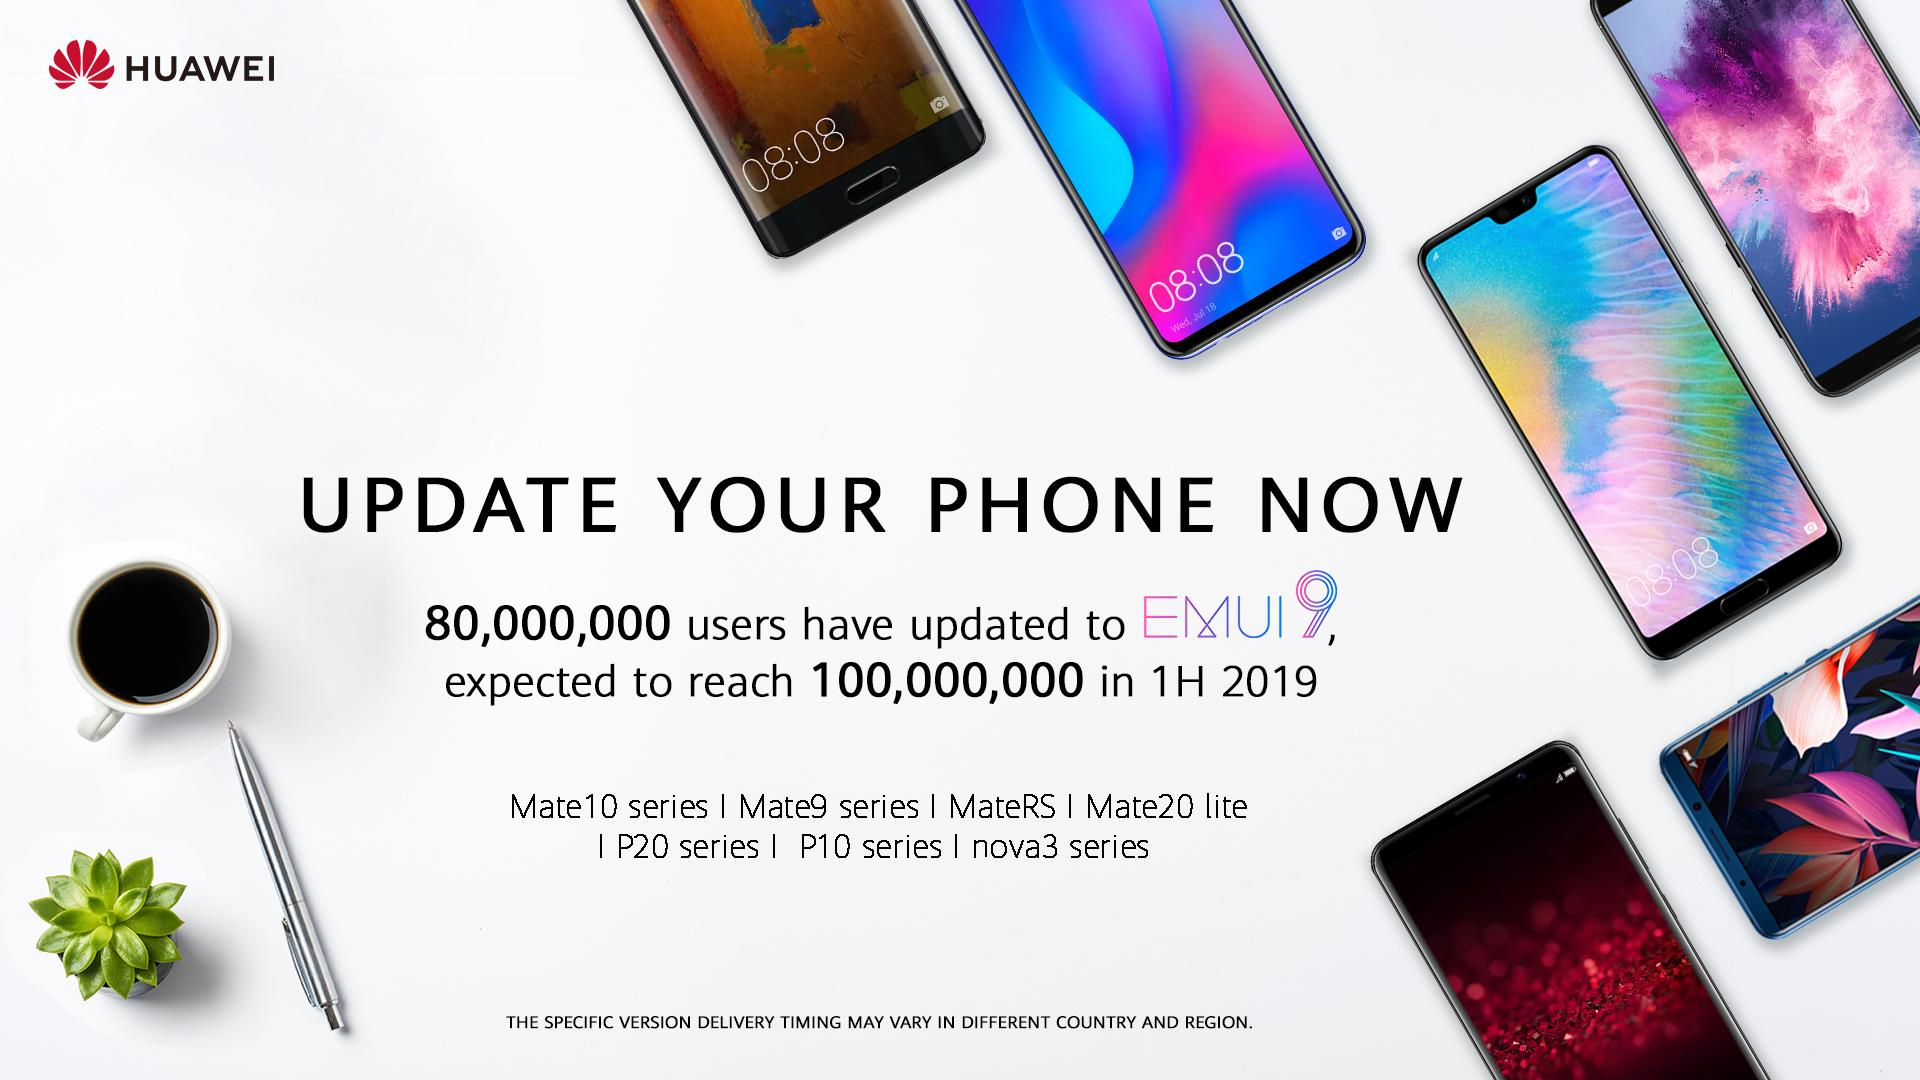 Aktualizacja Huawei P20 Lite EMUI 9.0 Mate 10 Lite mate 20 Lite